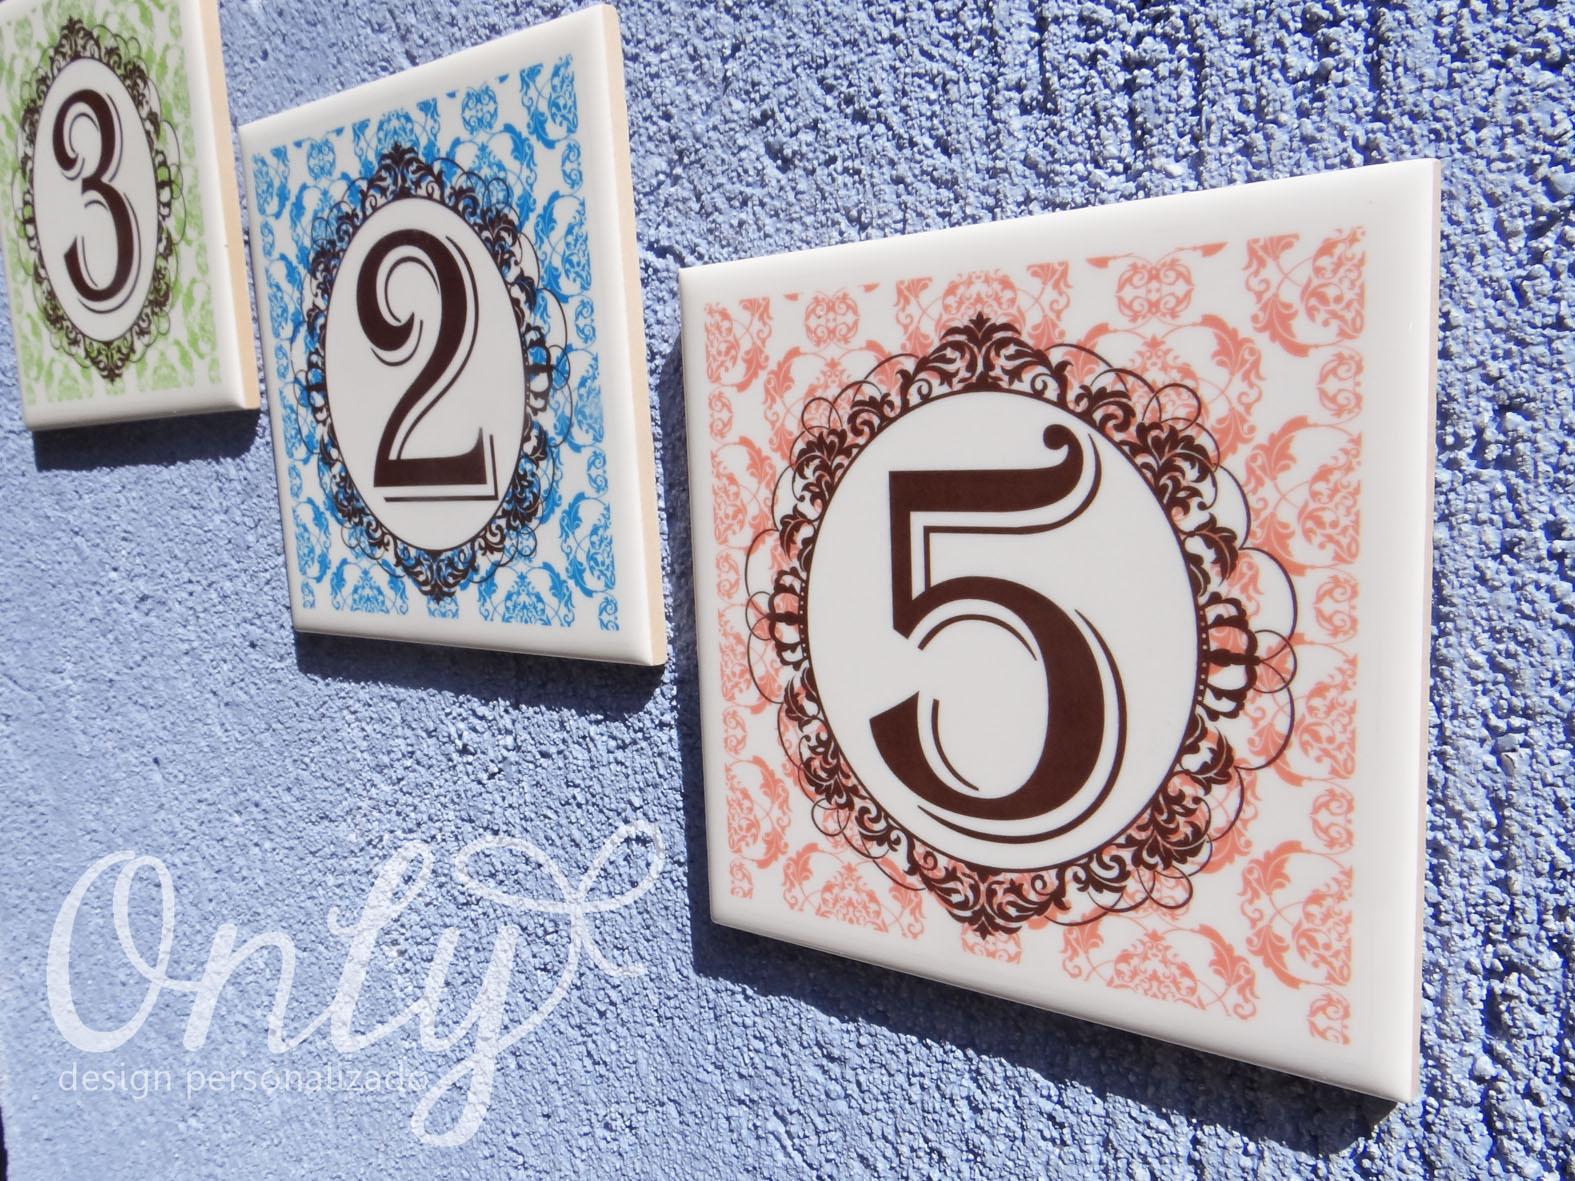 Azulejo n mero de casa scene personalizados elo7 for Azulejo numero casa